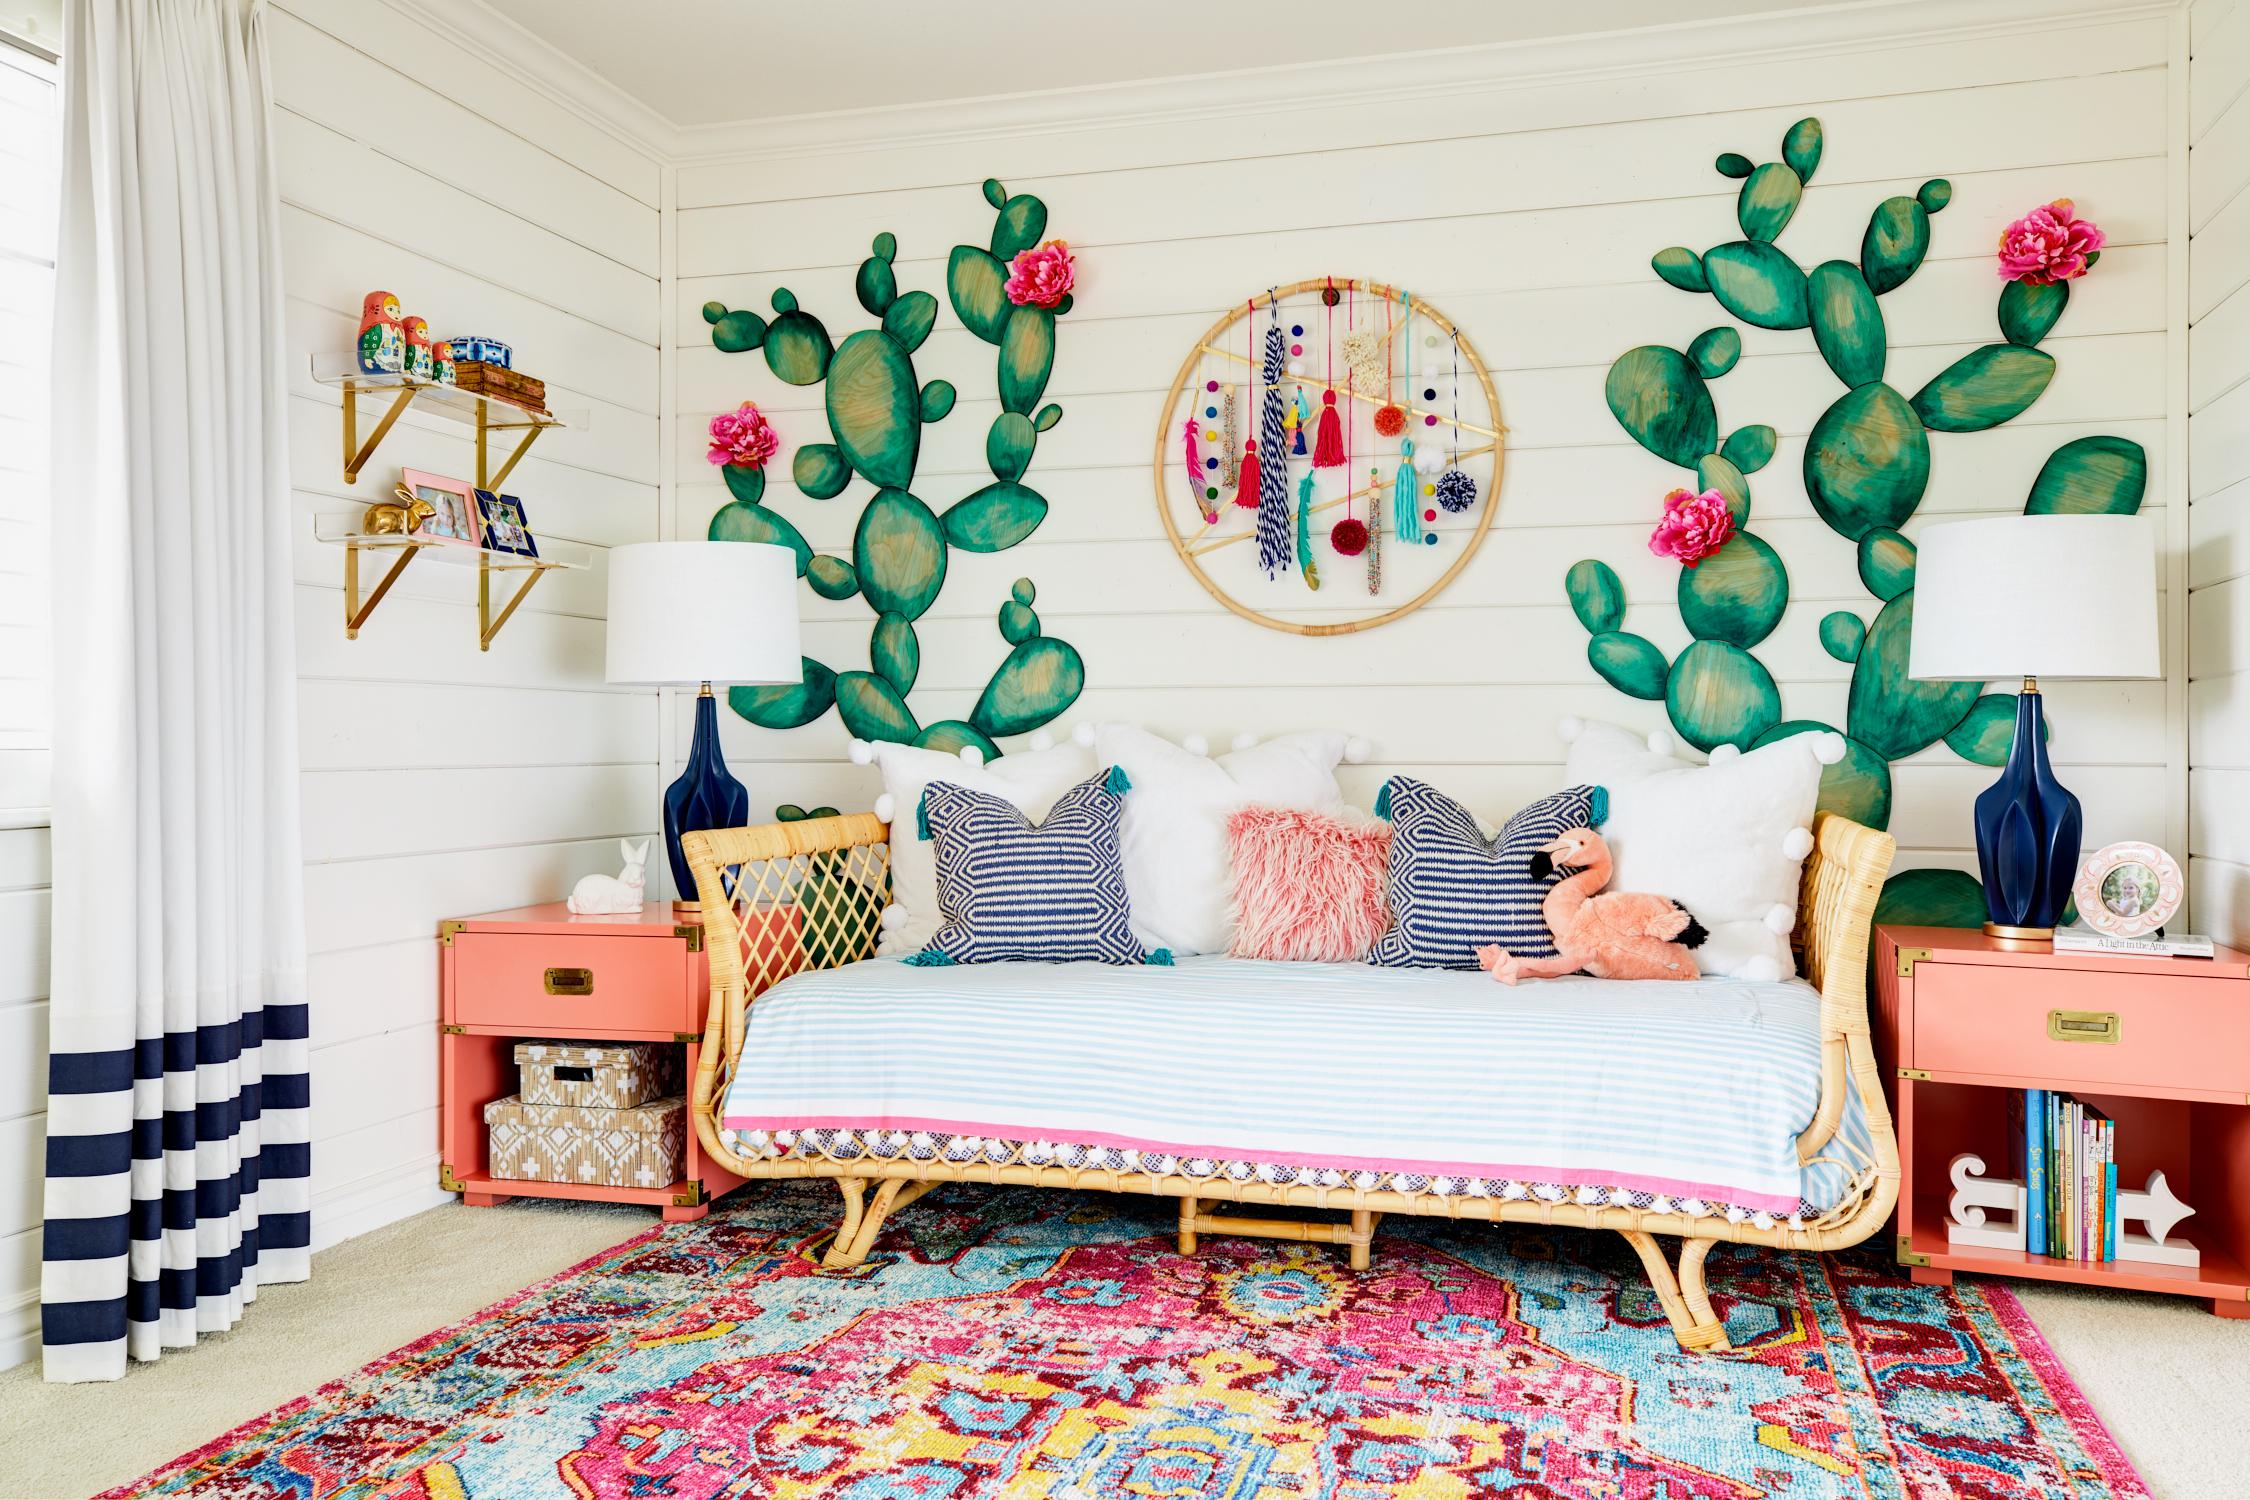 deco murale tendance boheme cactus salon